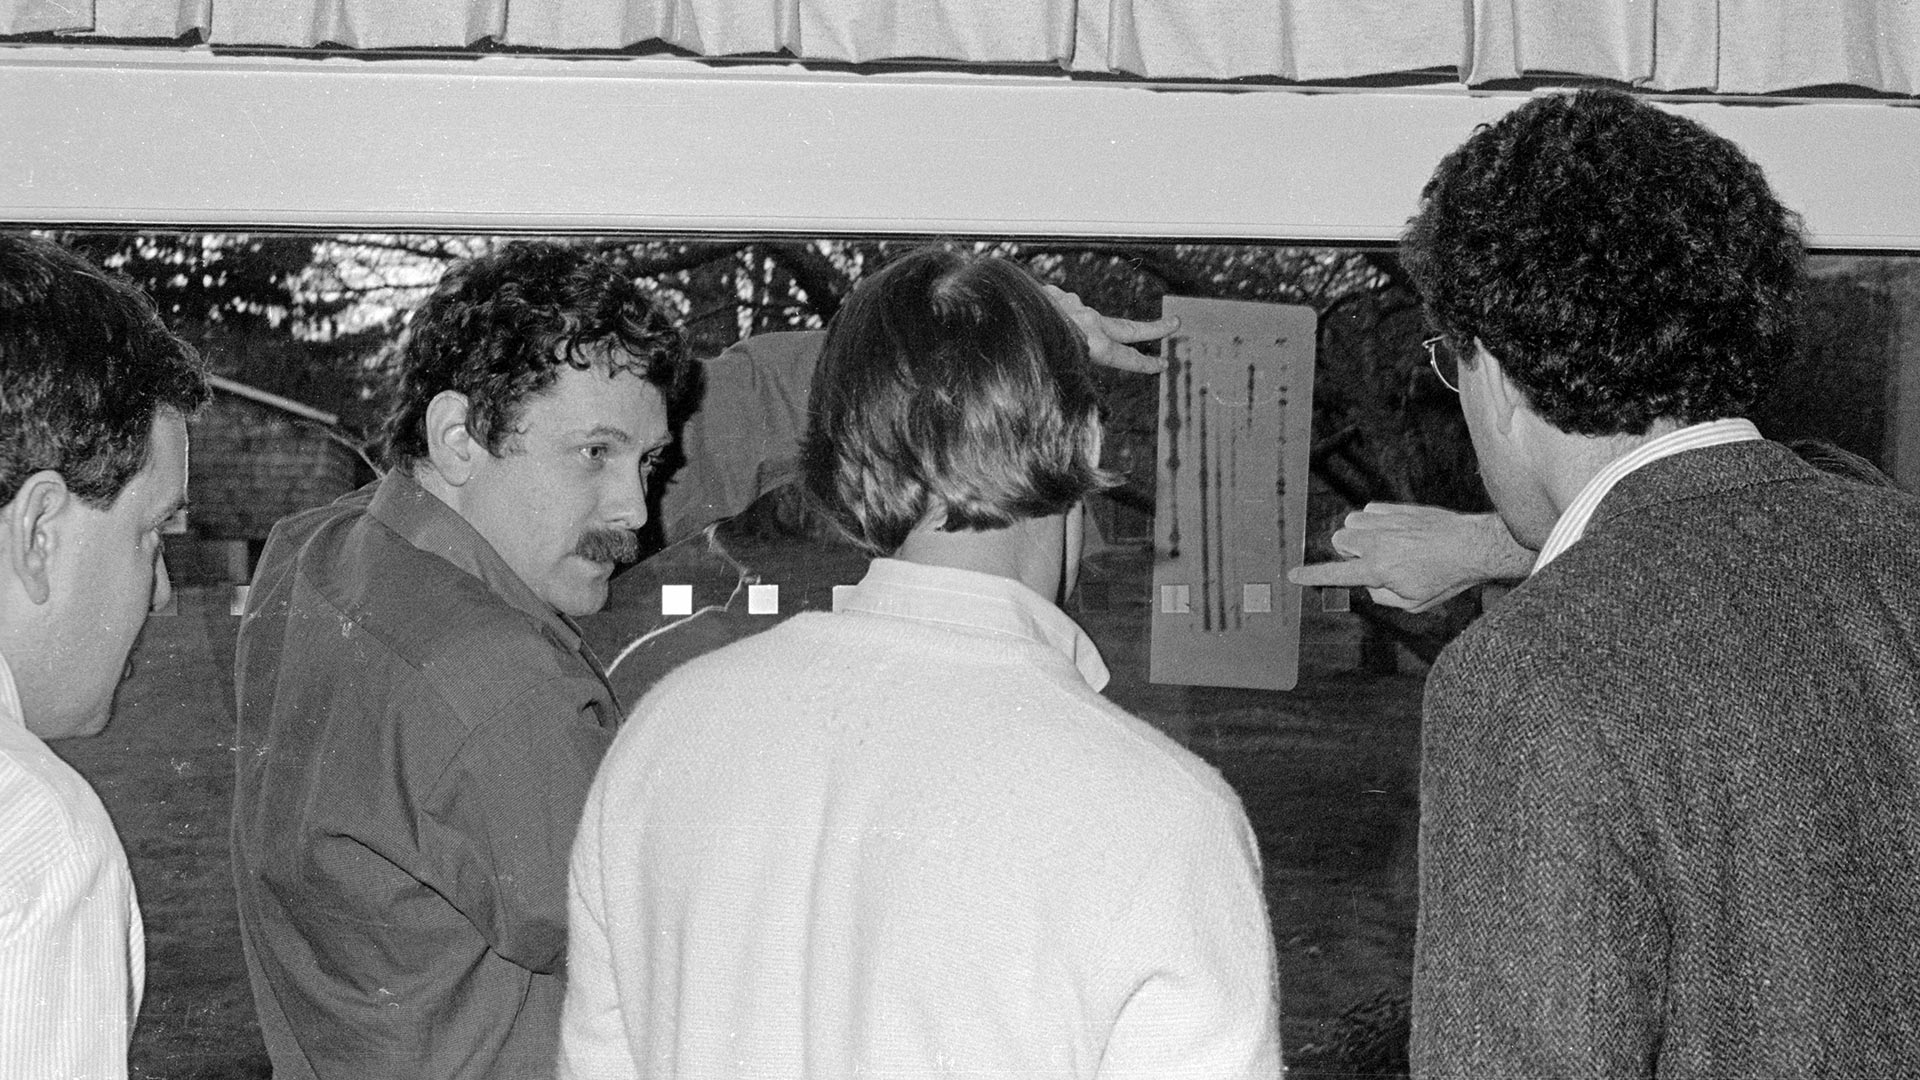 photo of Thomas Marr, Eric Lander, Rich Roberts, and Peter Neufeld at Banbury Center